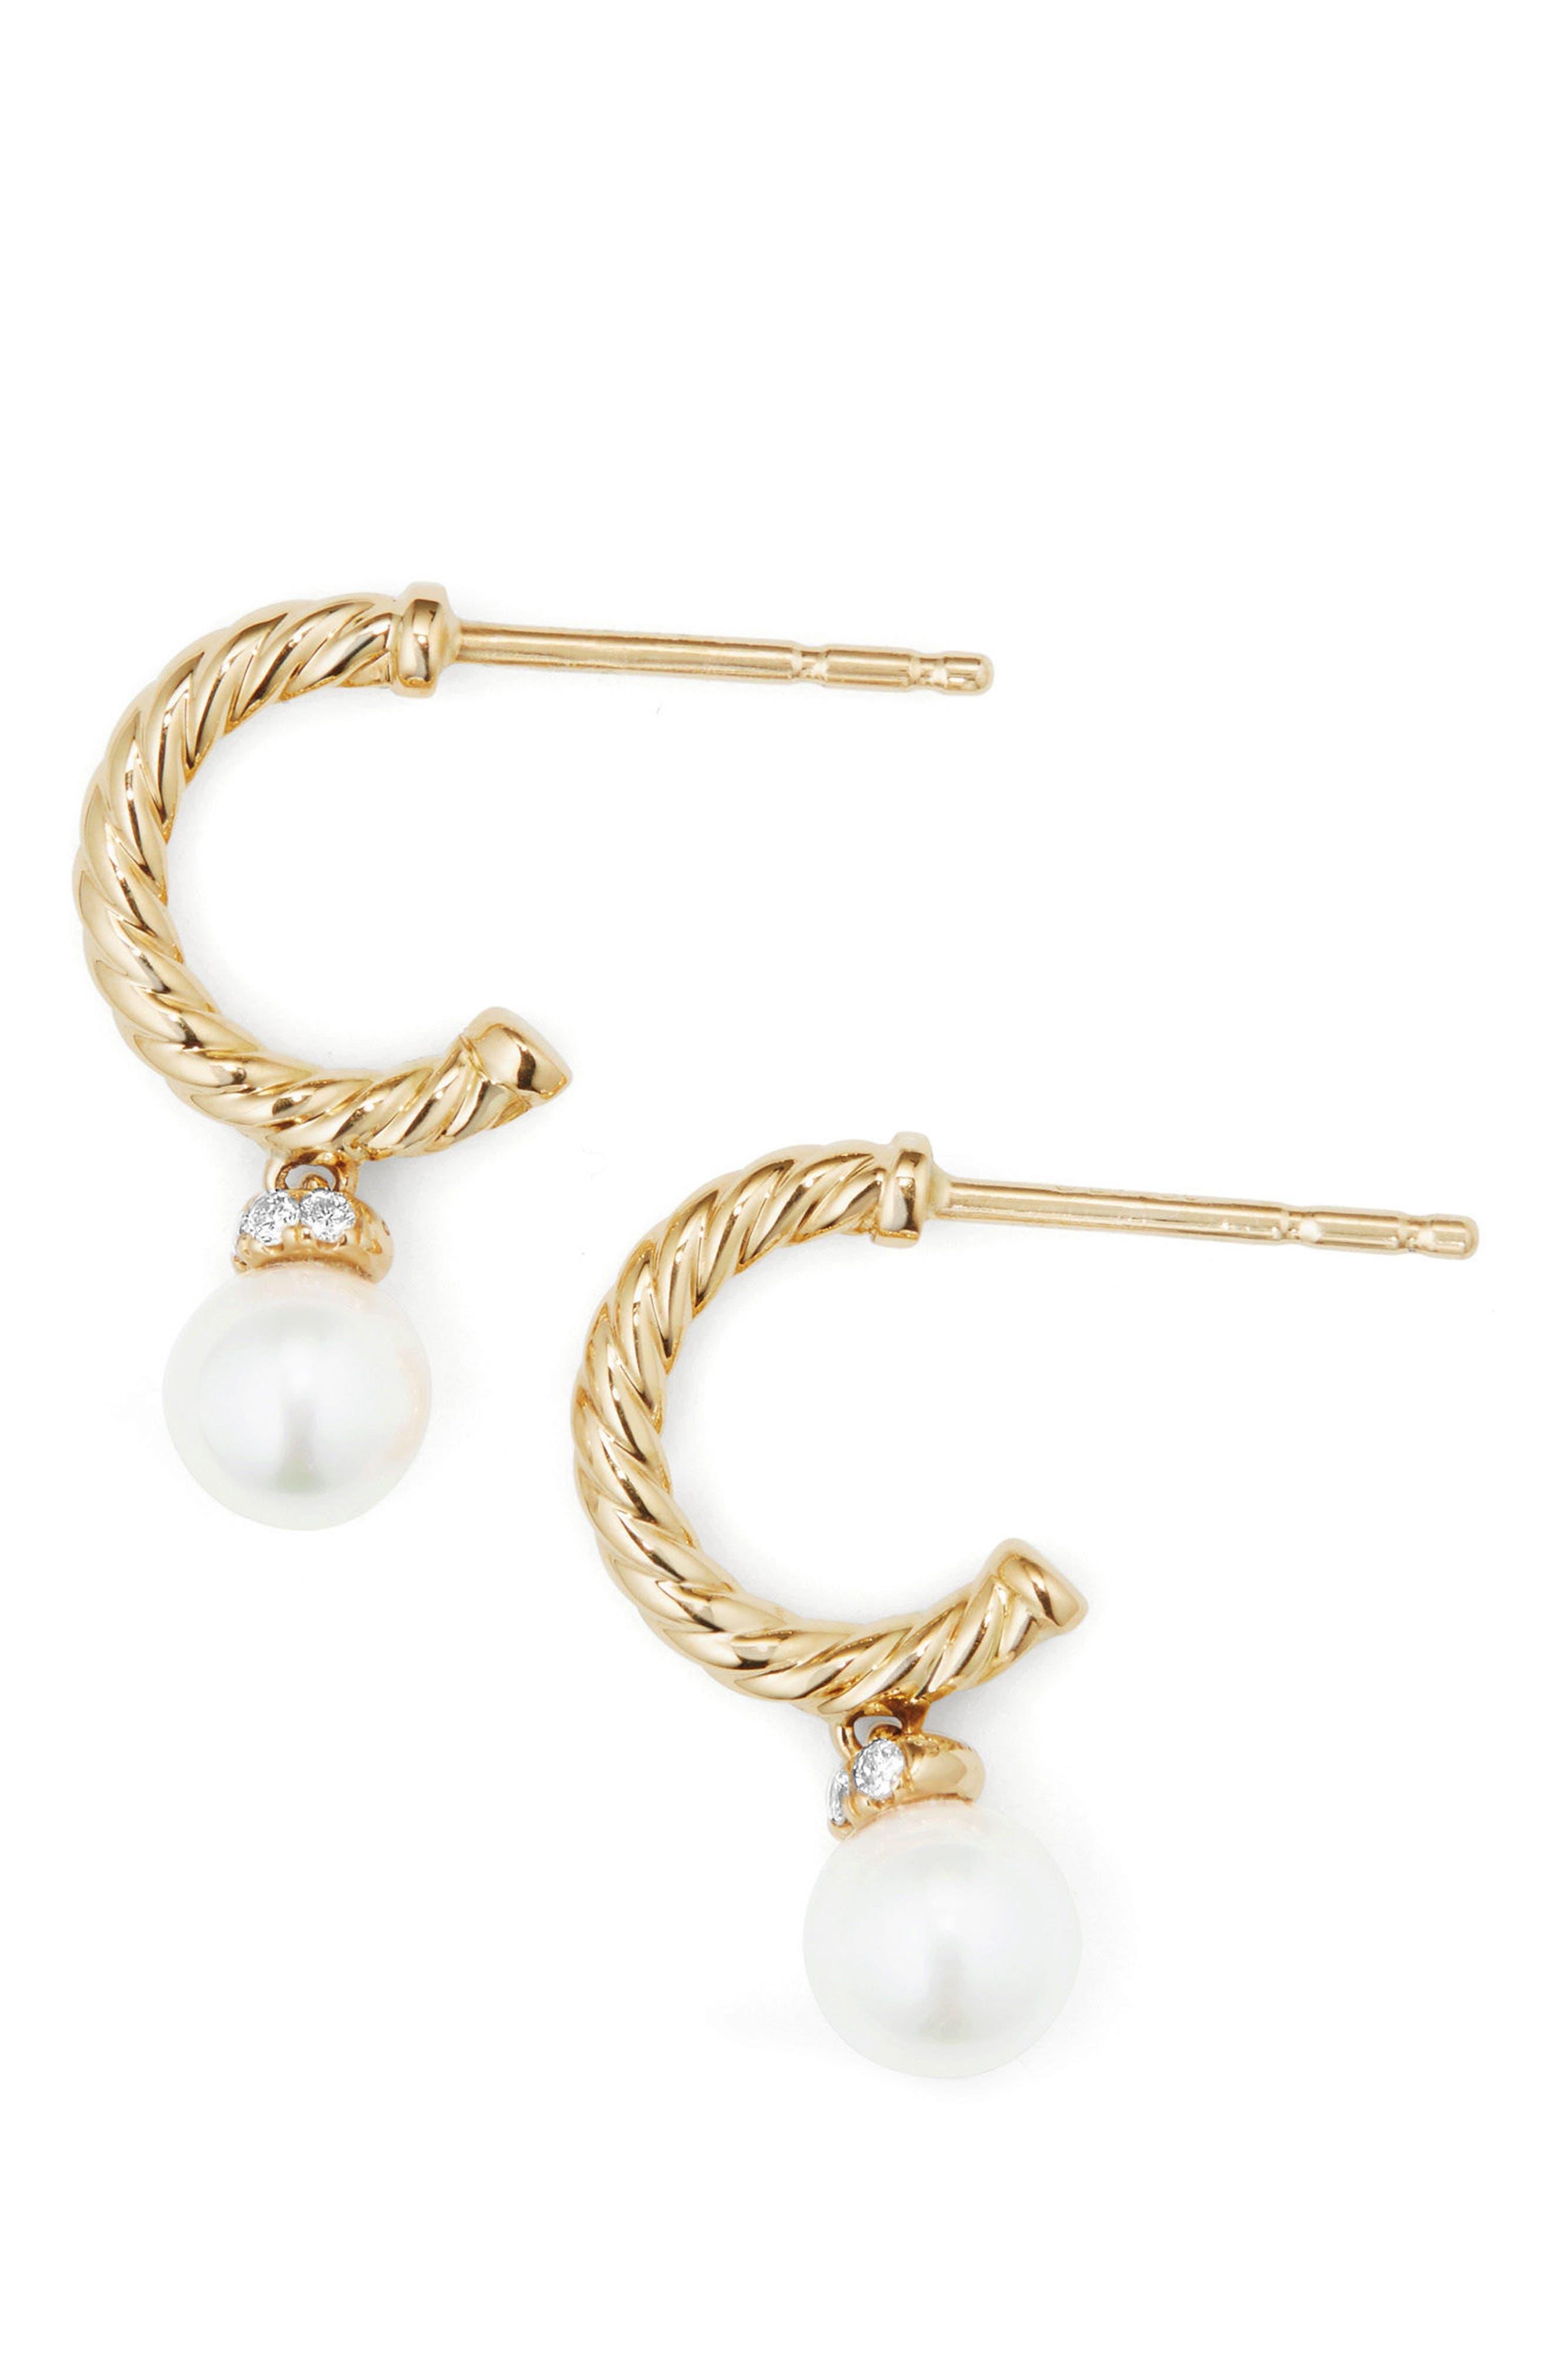 David Yurman Solari Hoop Earrings with Diamonds & Pearls in 18K Gold